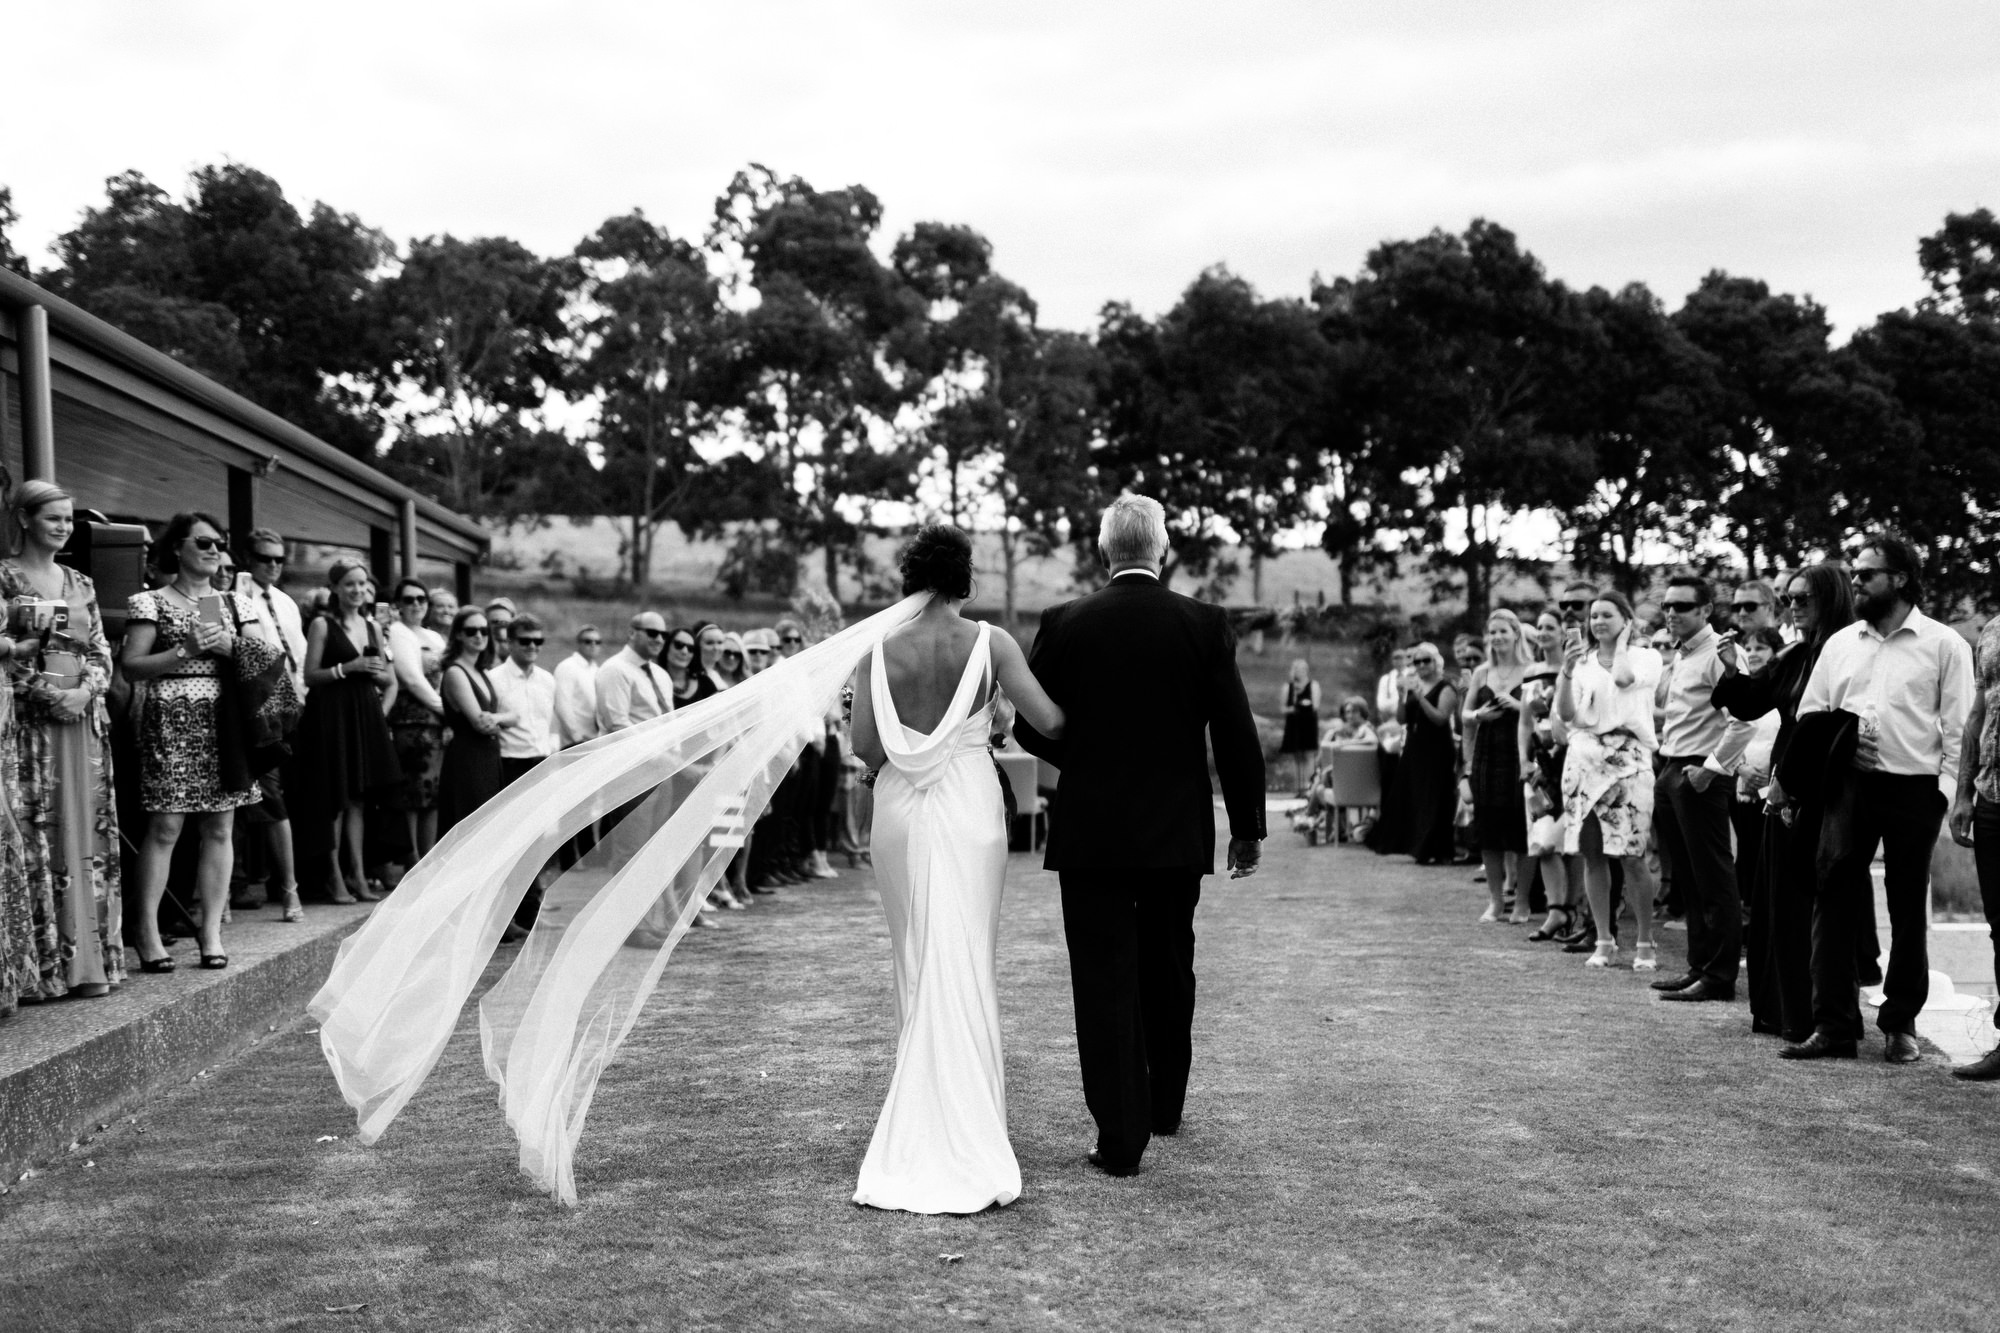 CLARK-WEDDING-EDITH-VALLEY-CARTER-ROSE-PHOTOGRAPHY-205.JPG